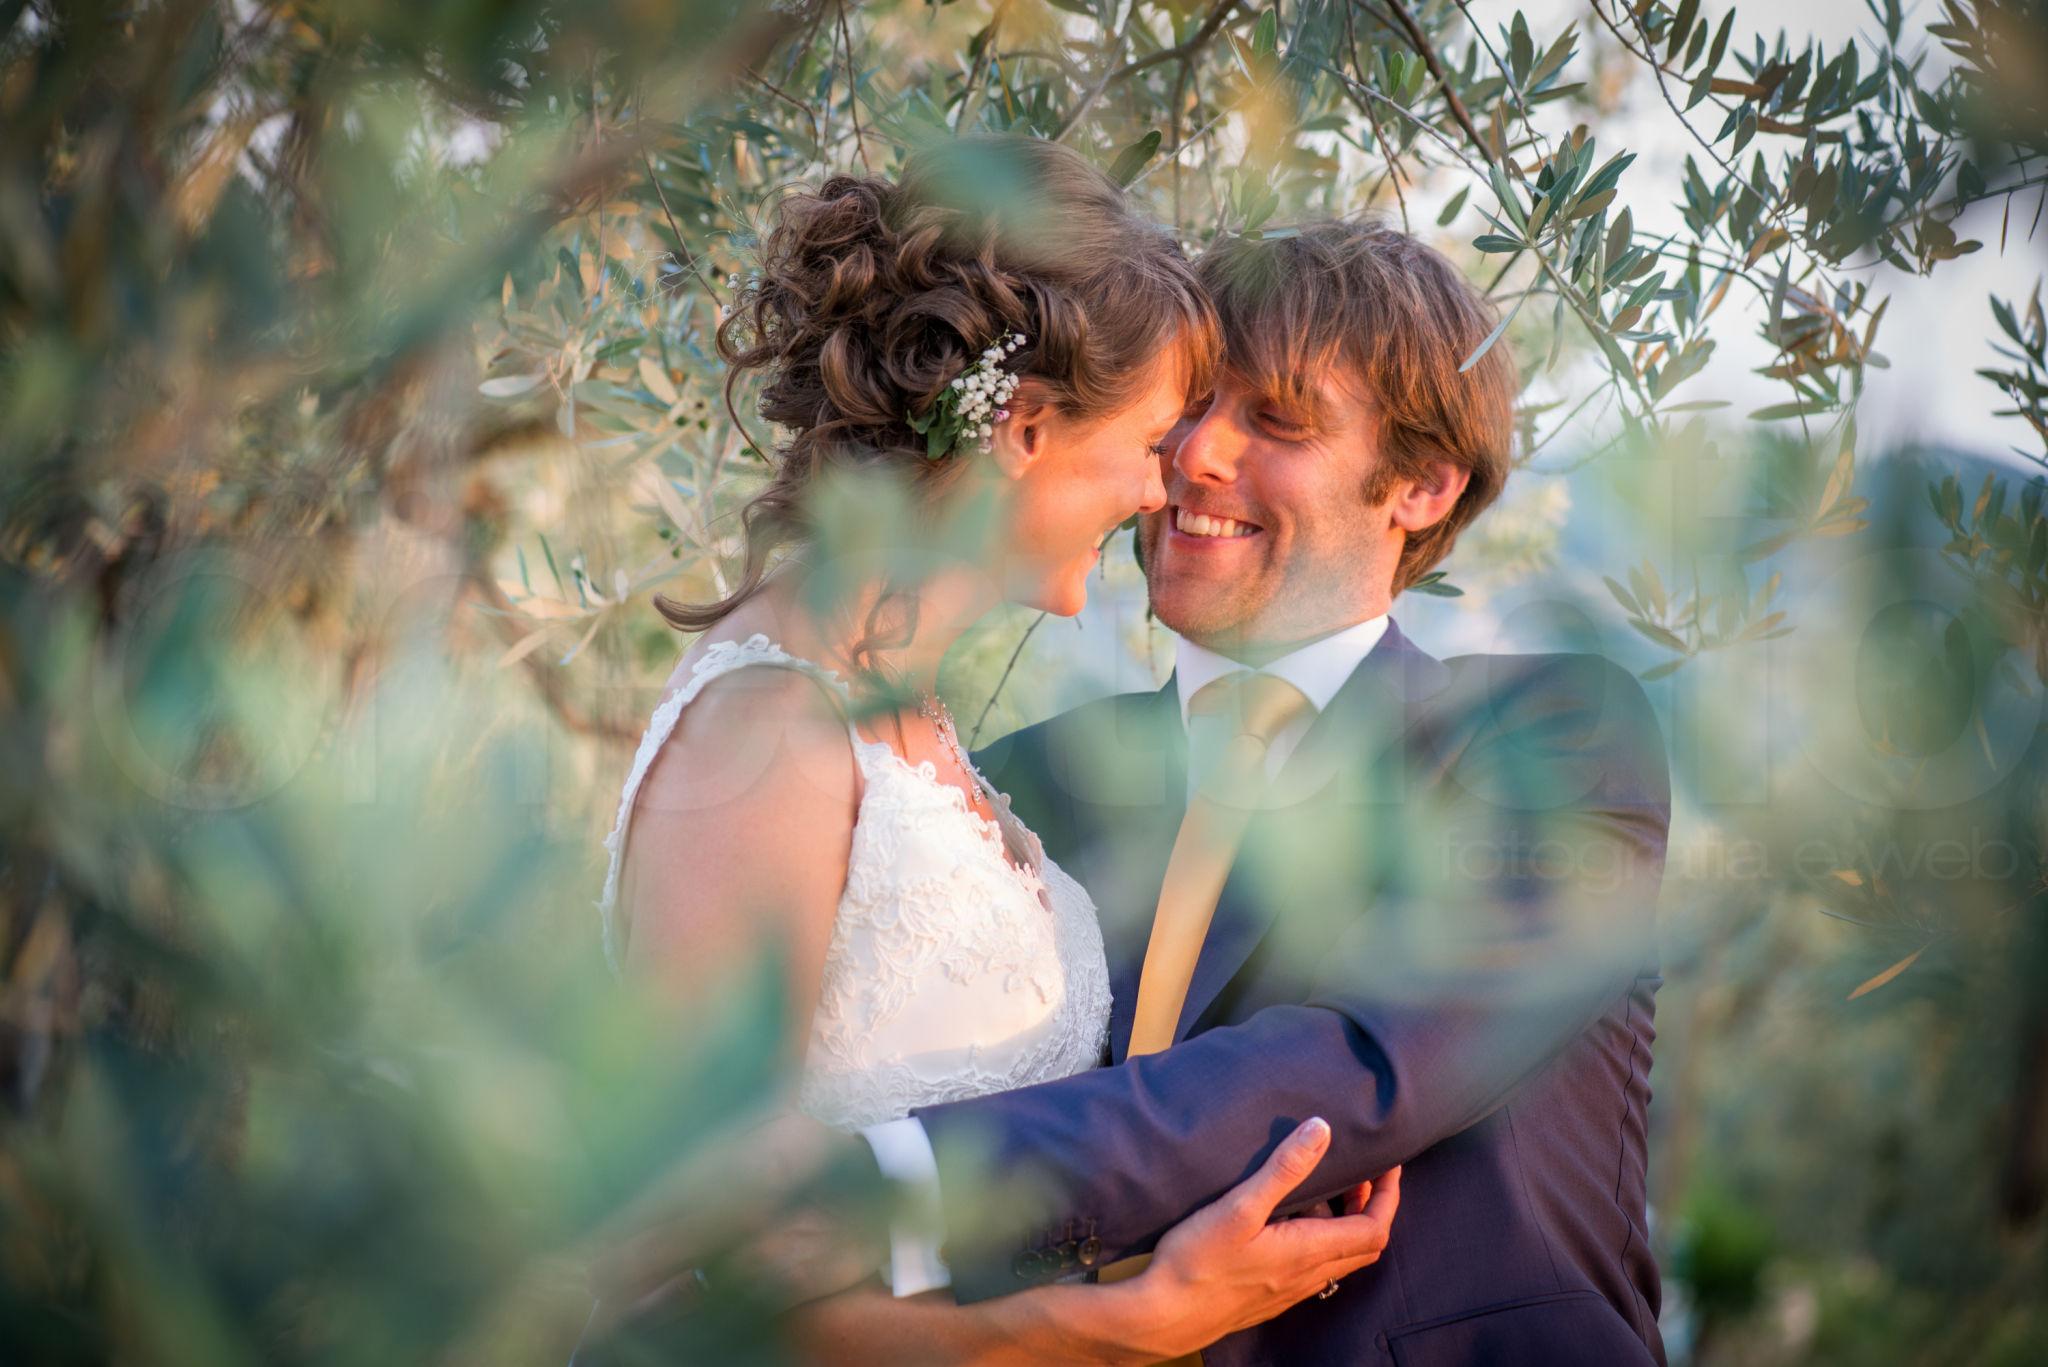 http://lnx.mirkone.it/wp-content/uploads/2015/07/fotografo-matrimoni-faenza-0027.jpg